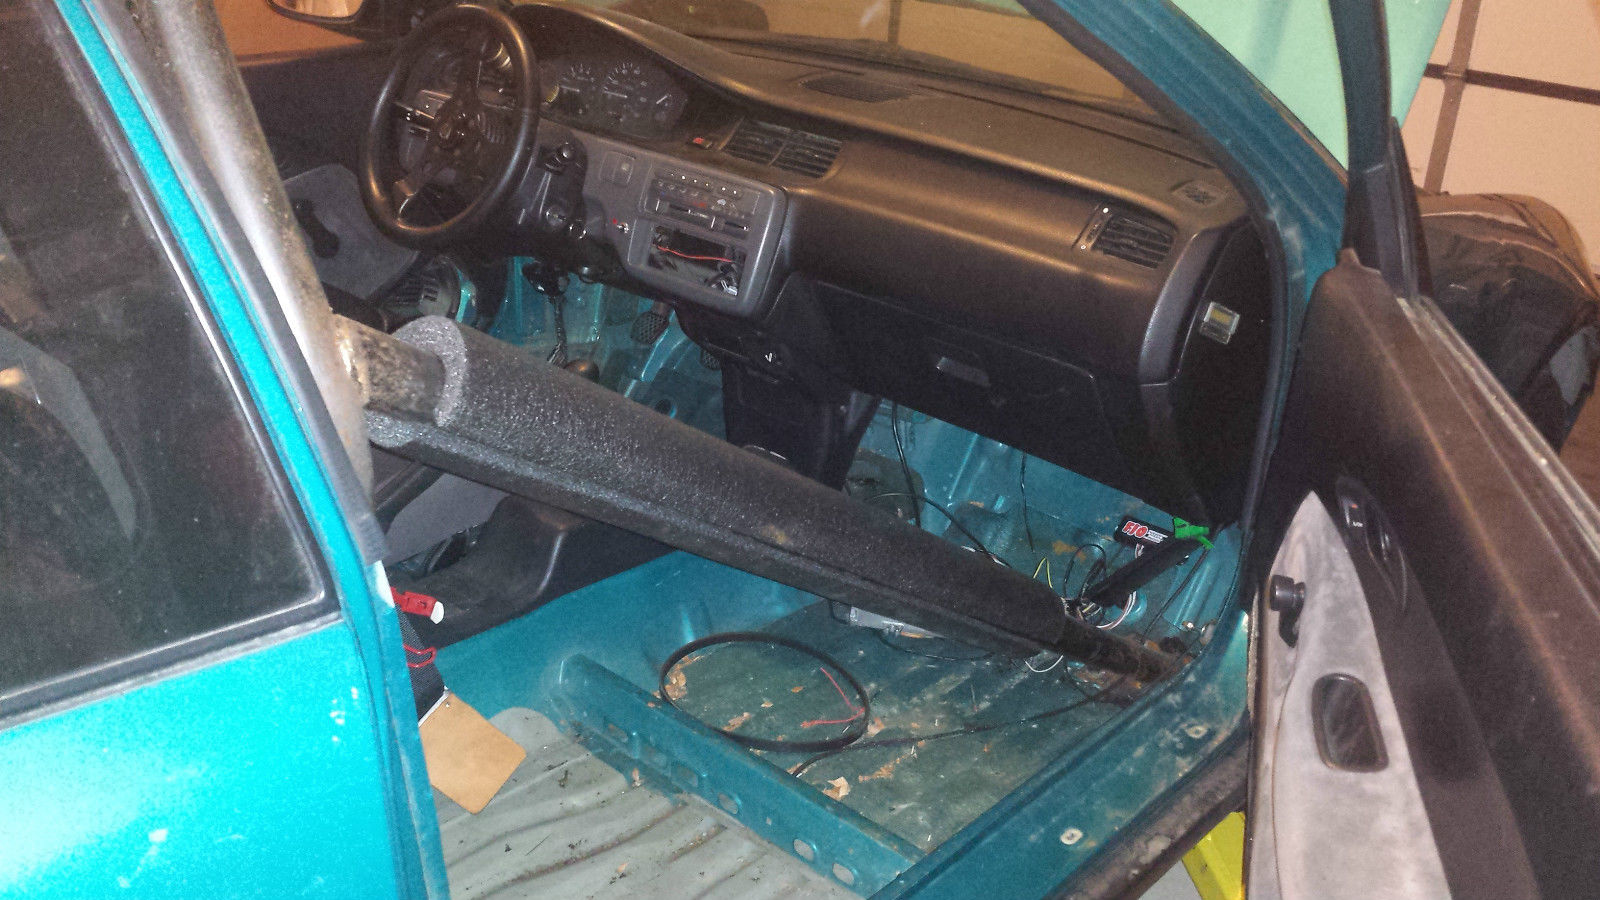 1993 Honda Civic hatchback, built sleeved turbo D16Z6 604WHP/385WTQ Street/Strip - Classic Honda ...